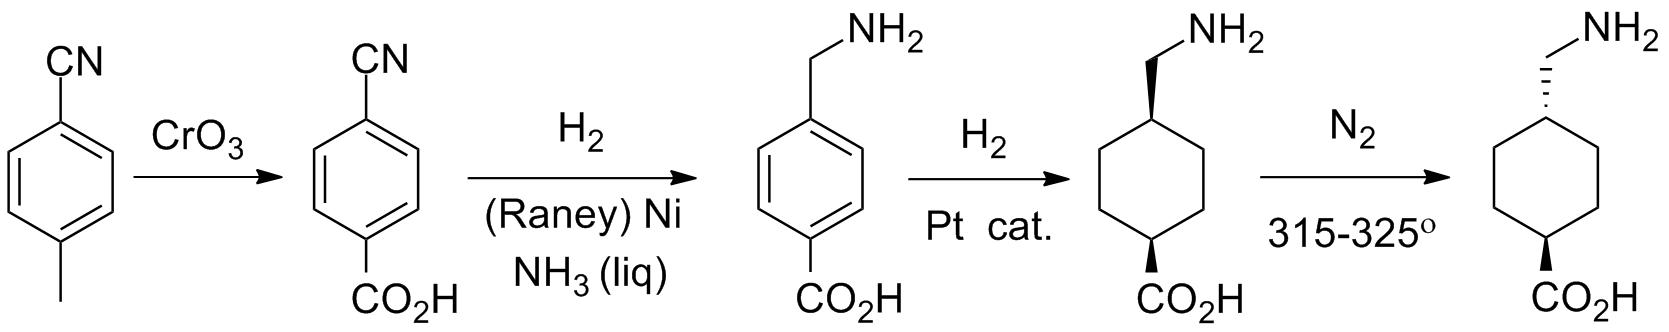 sythesis of triphenylmethanol